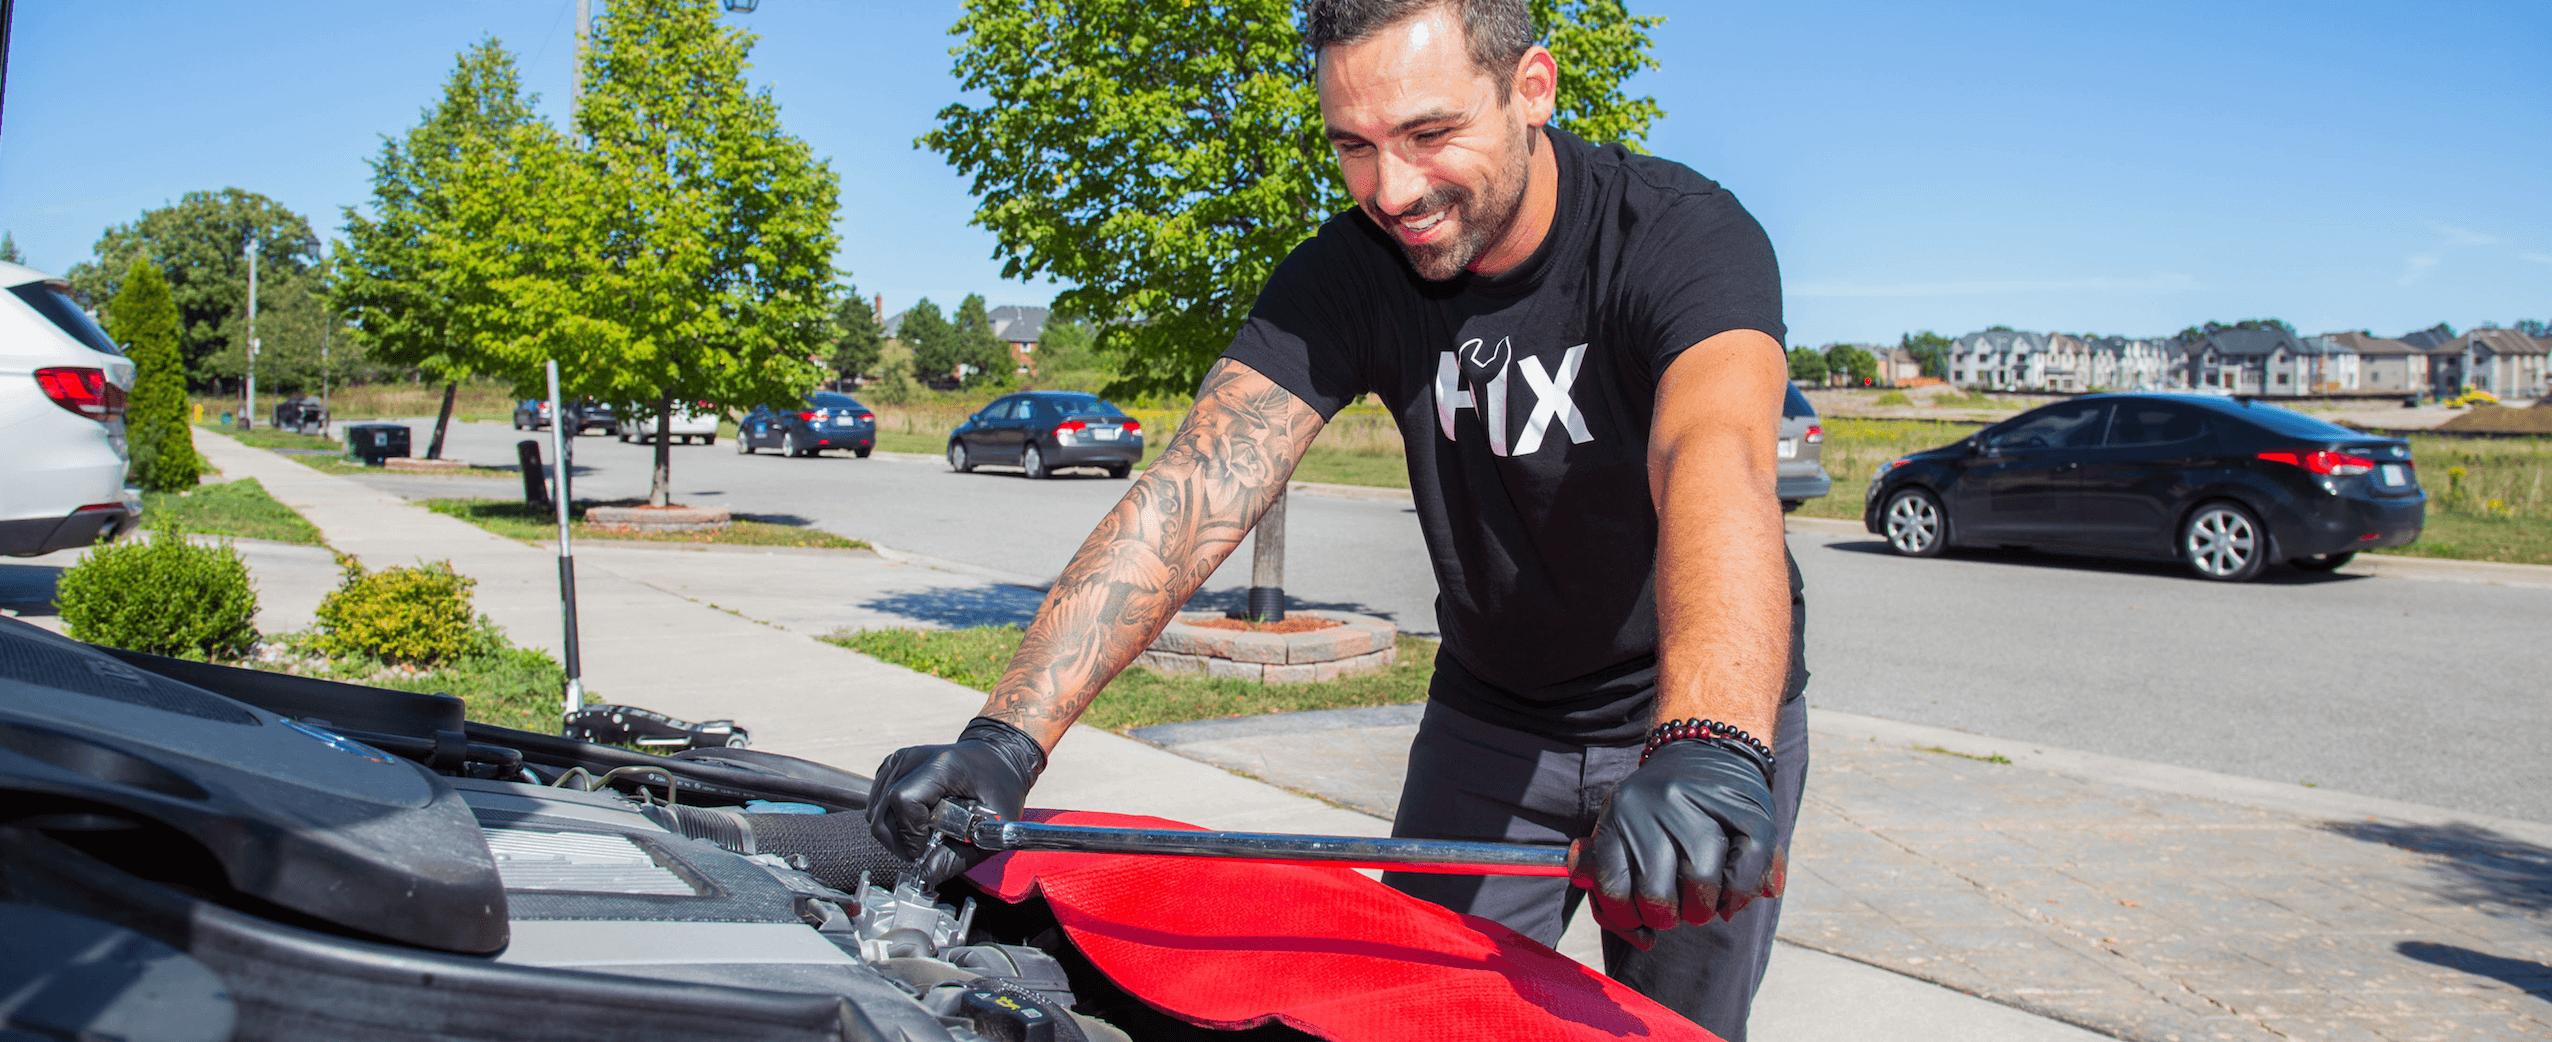 Car Is Leaking Fluids Inspection